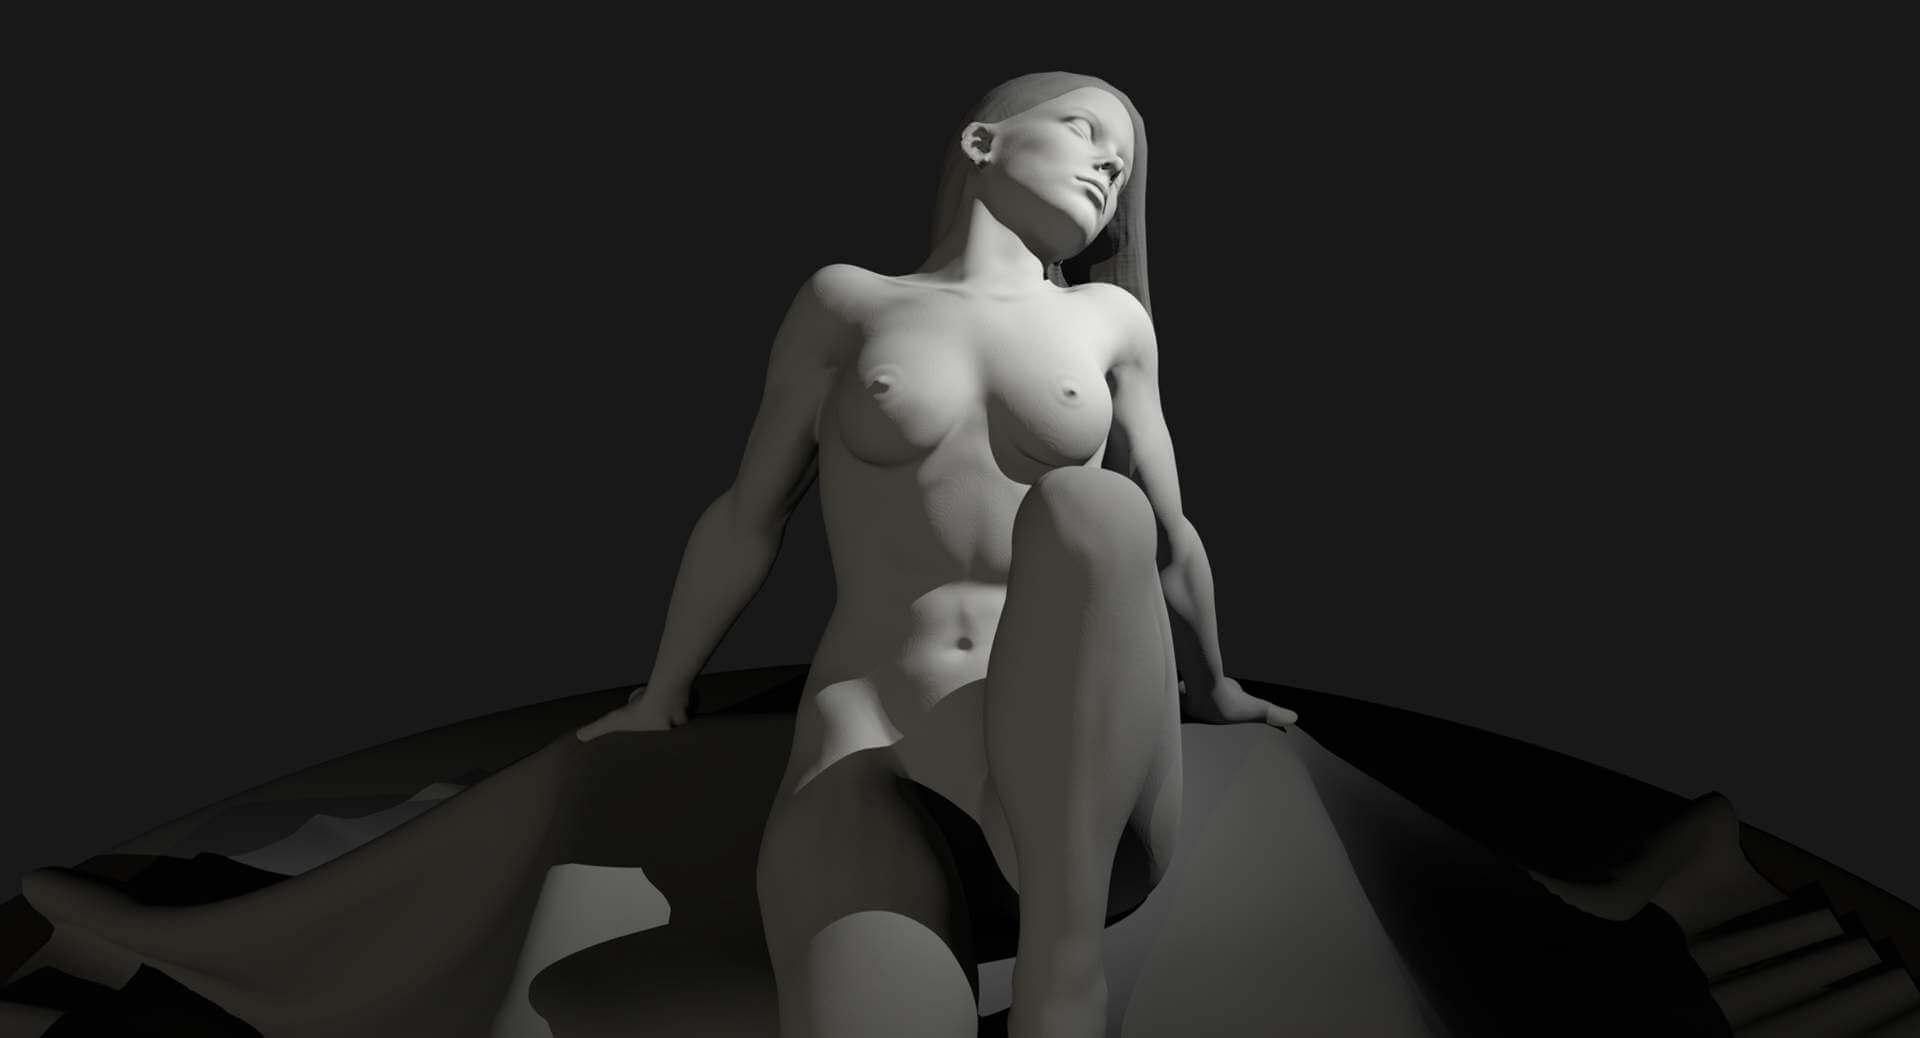 Amazing 3D Porn Art nude female art model 3d model